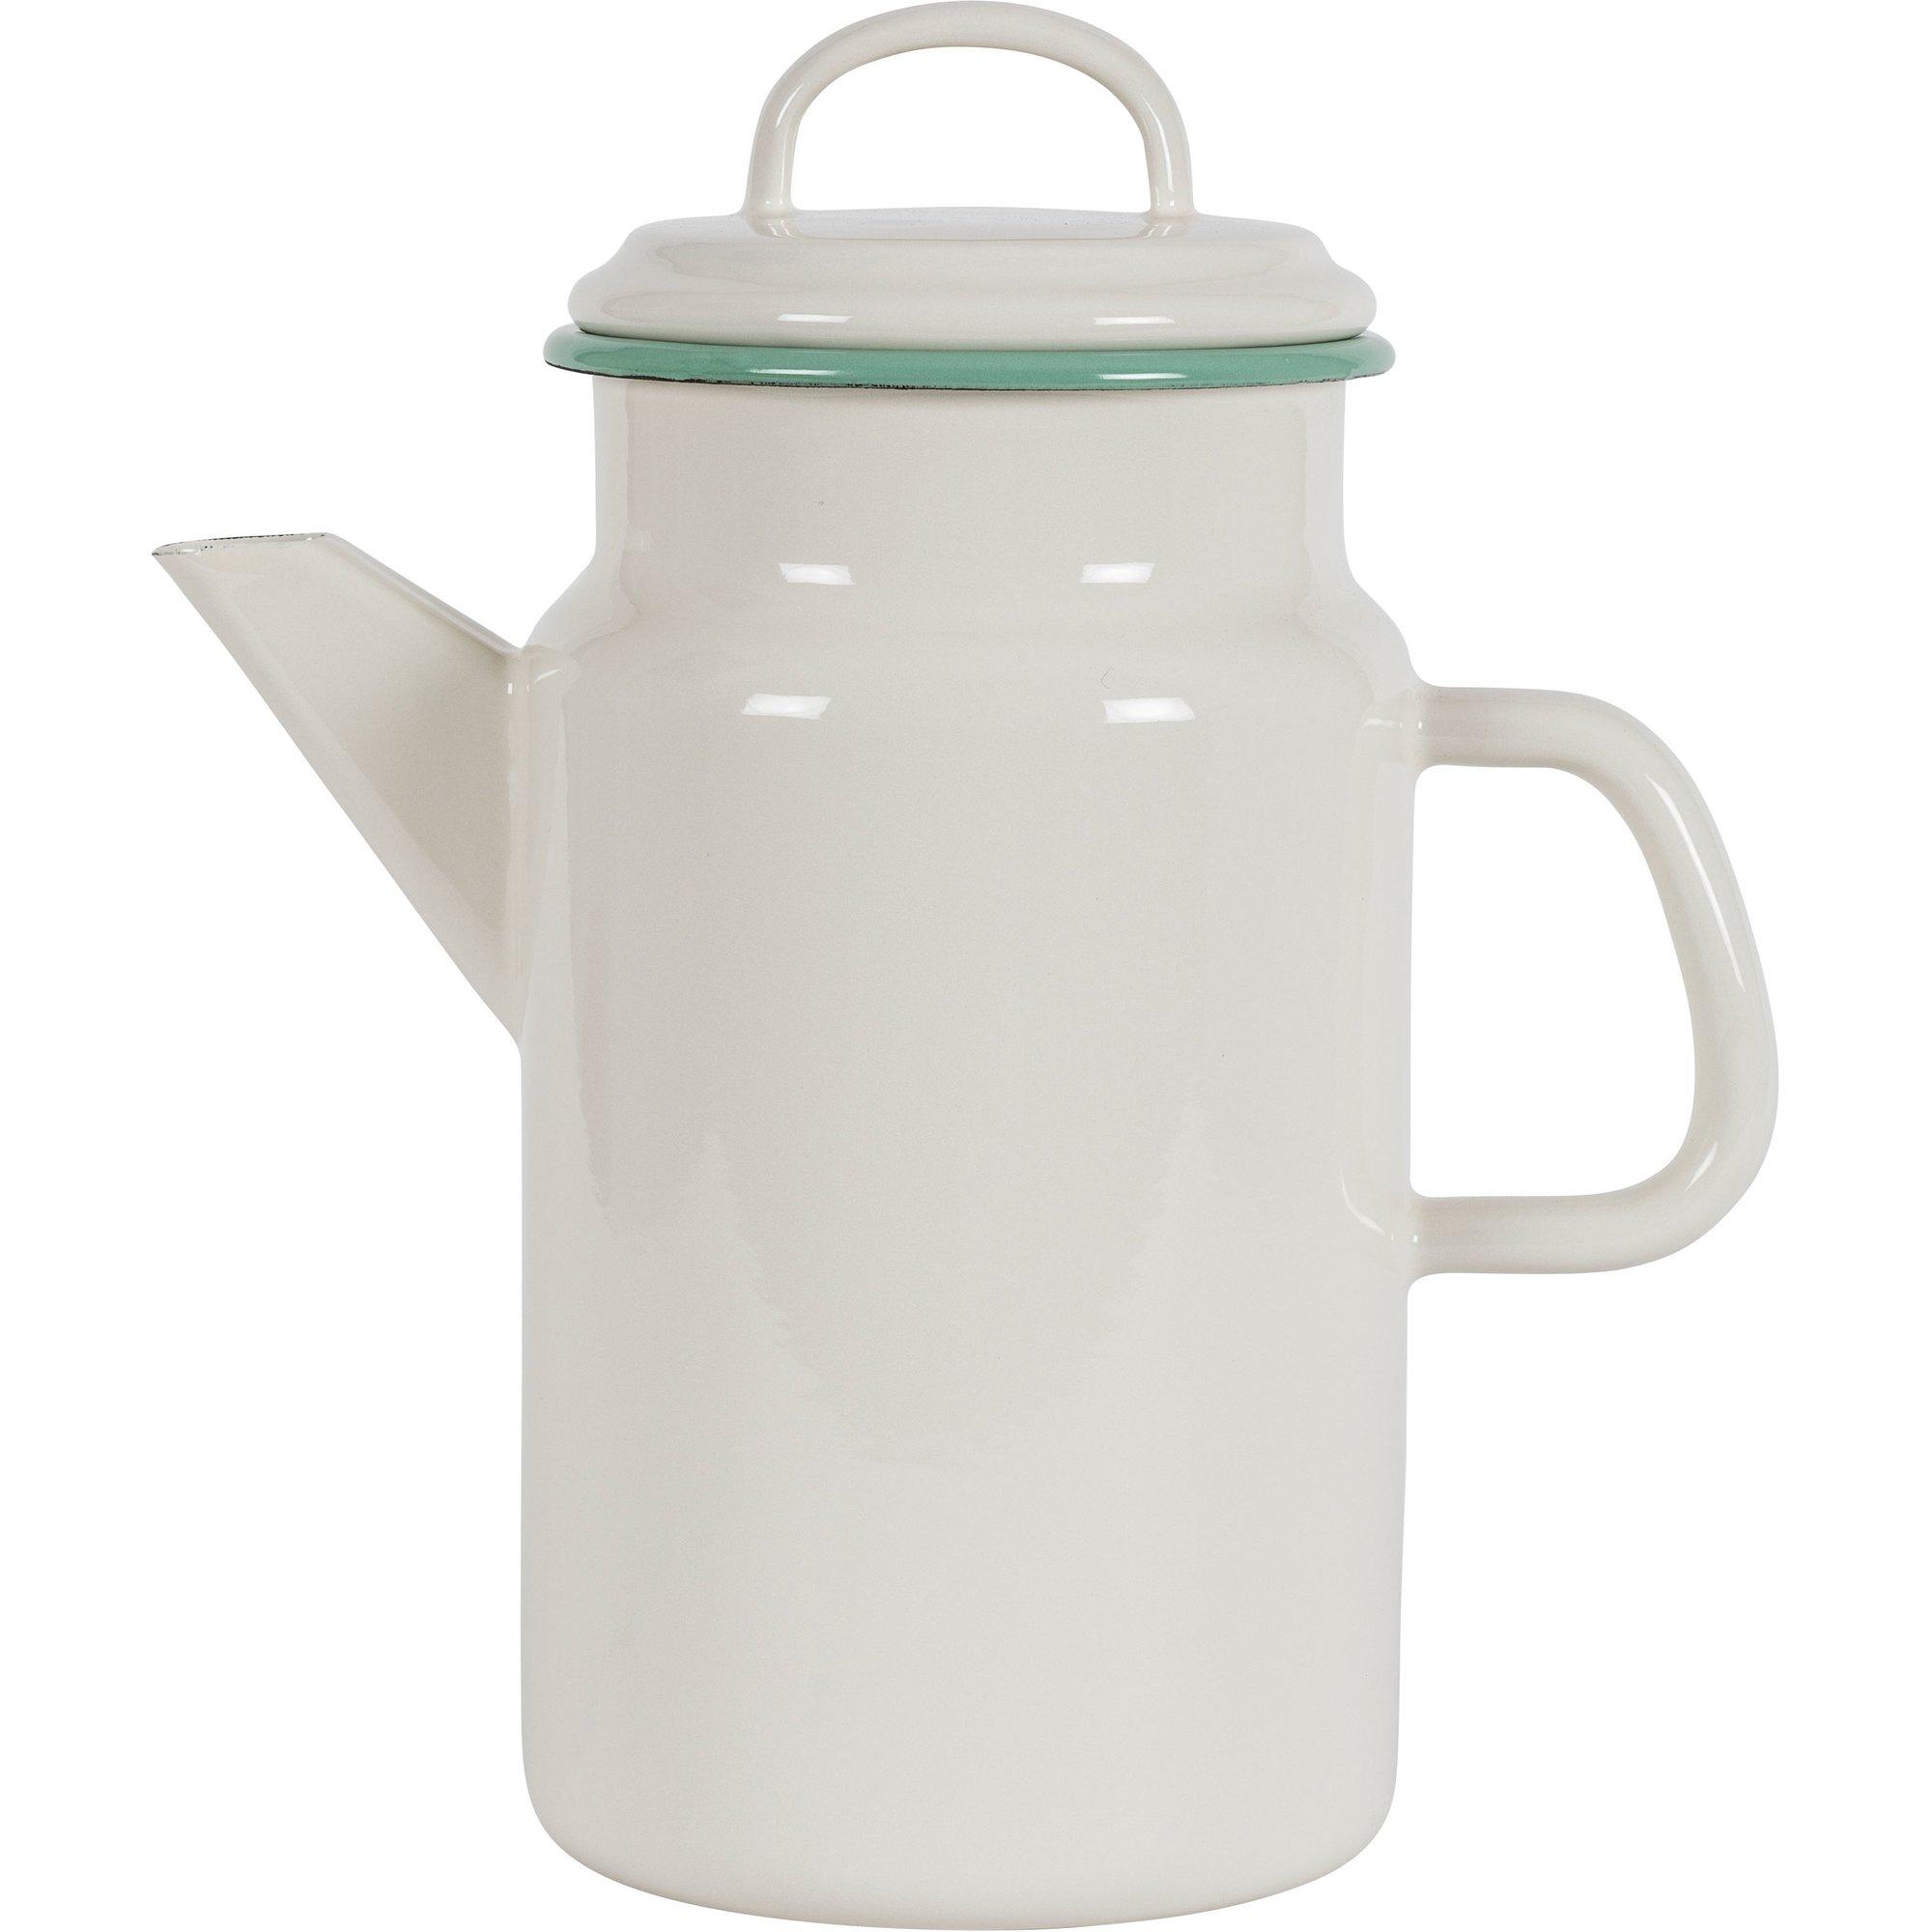 Kockums Jernverk Tekanna 2 liter creme